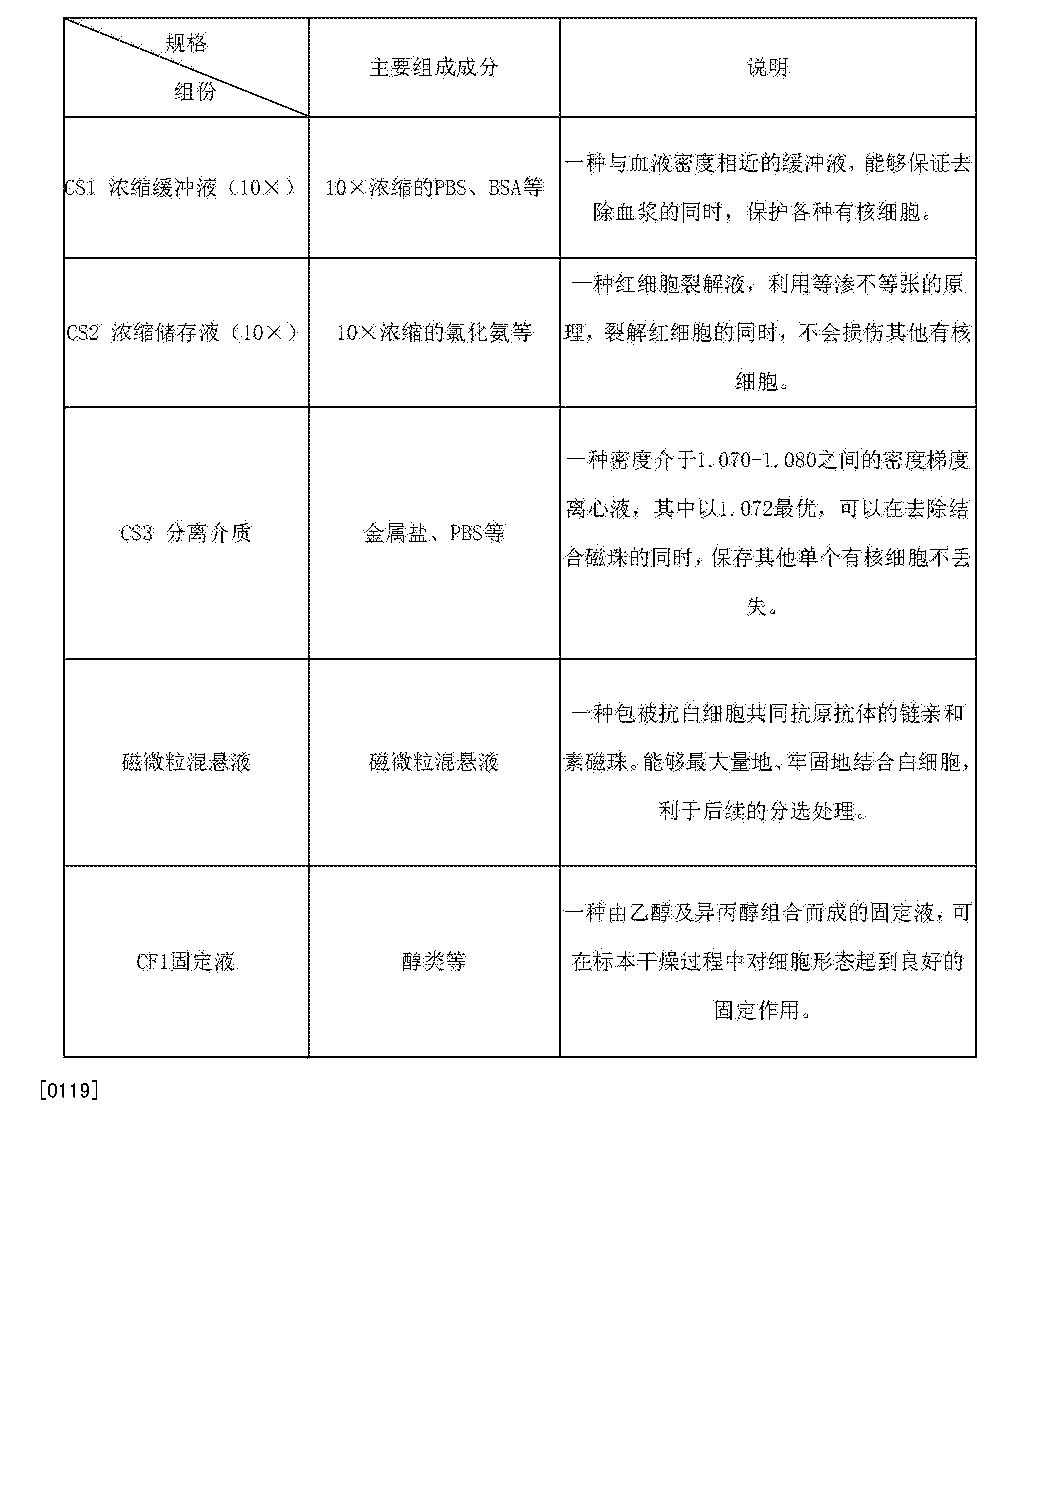 Figure CN105087778AD00121